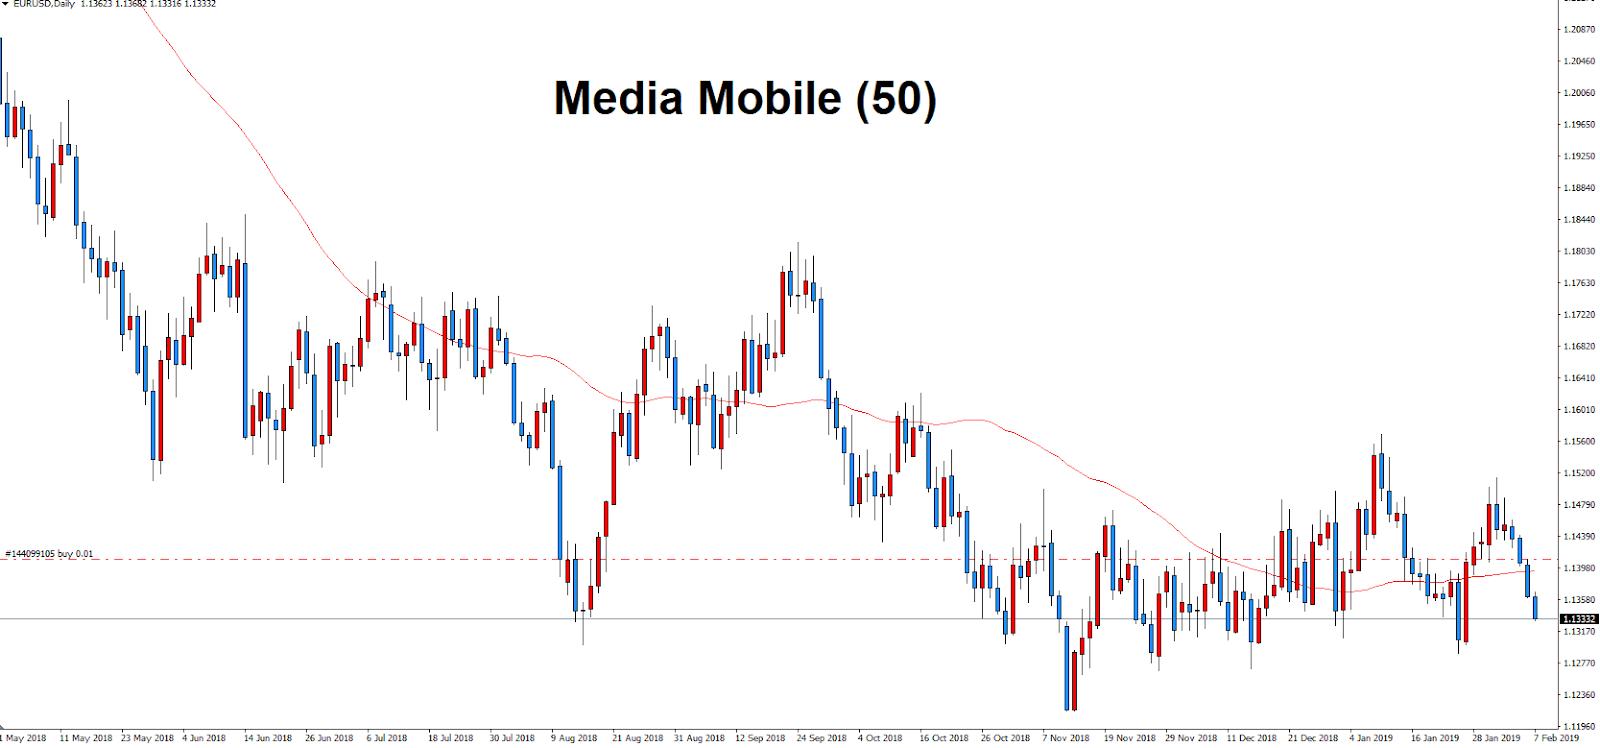 analisi tecnica trading media mobile